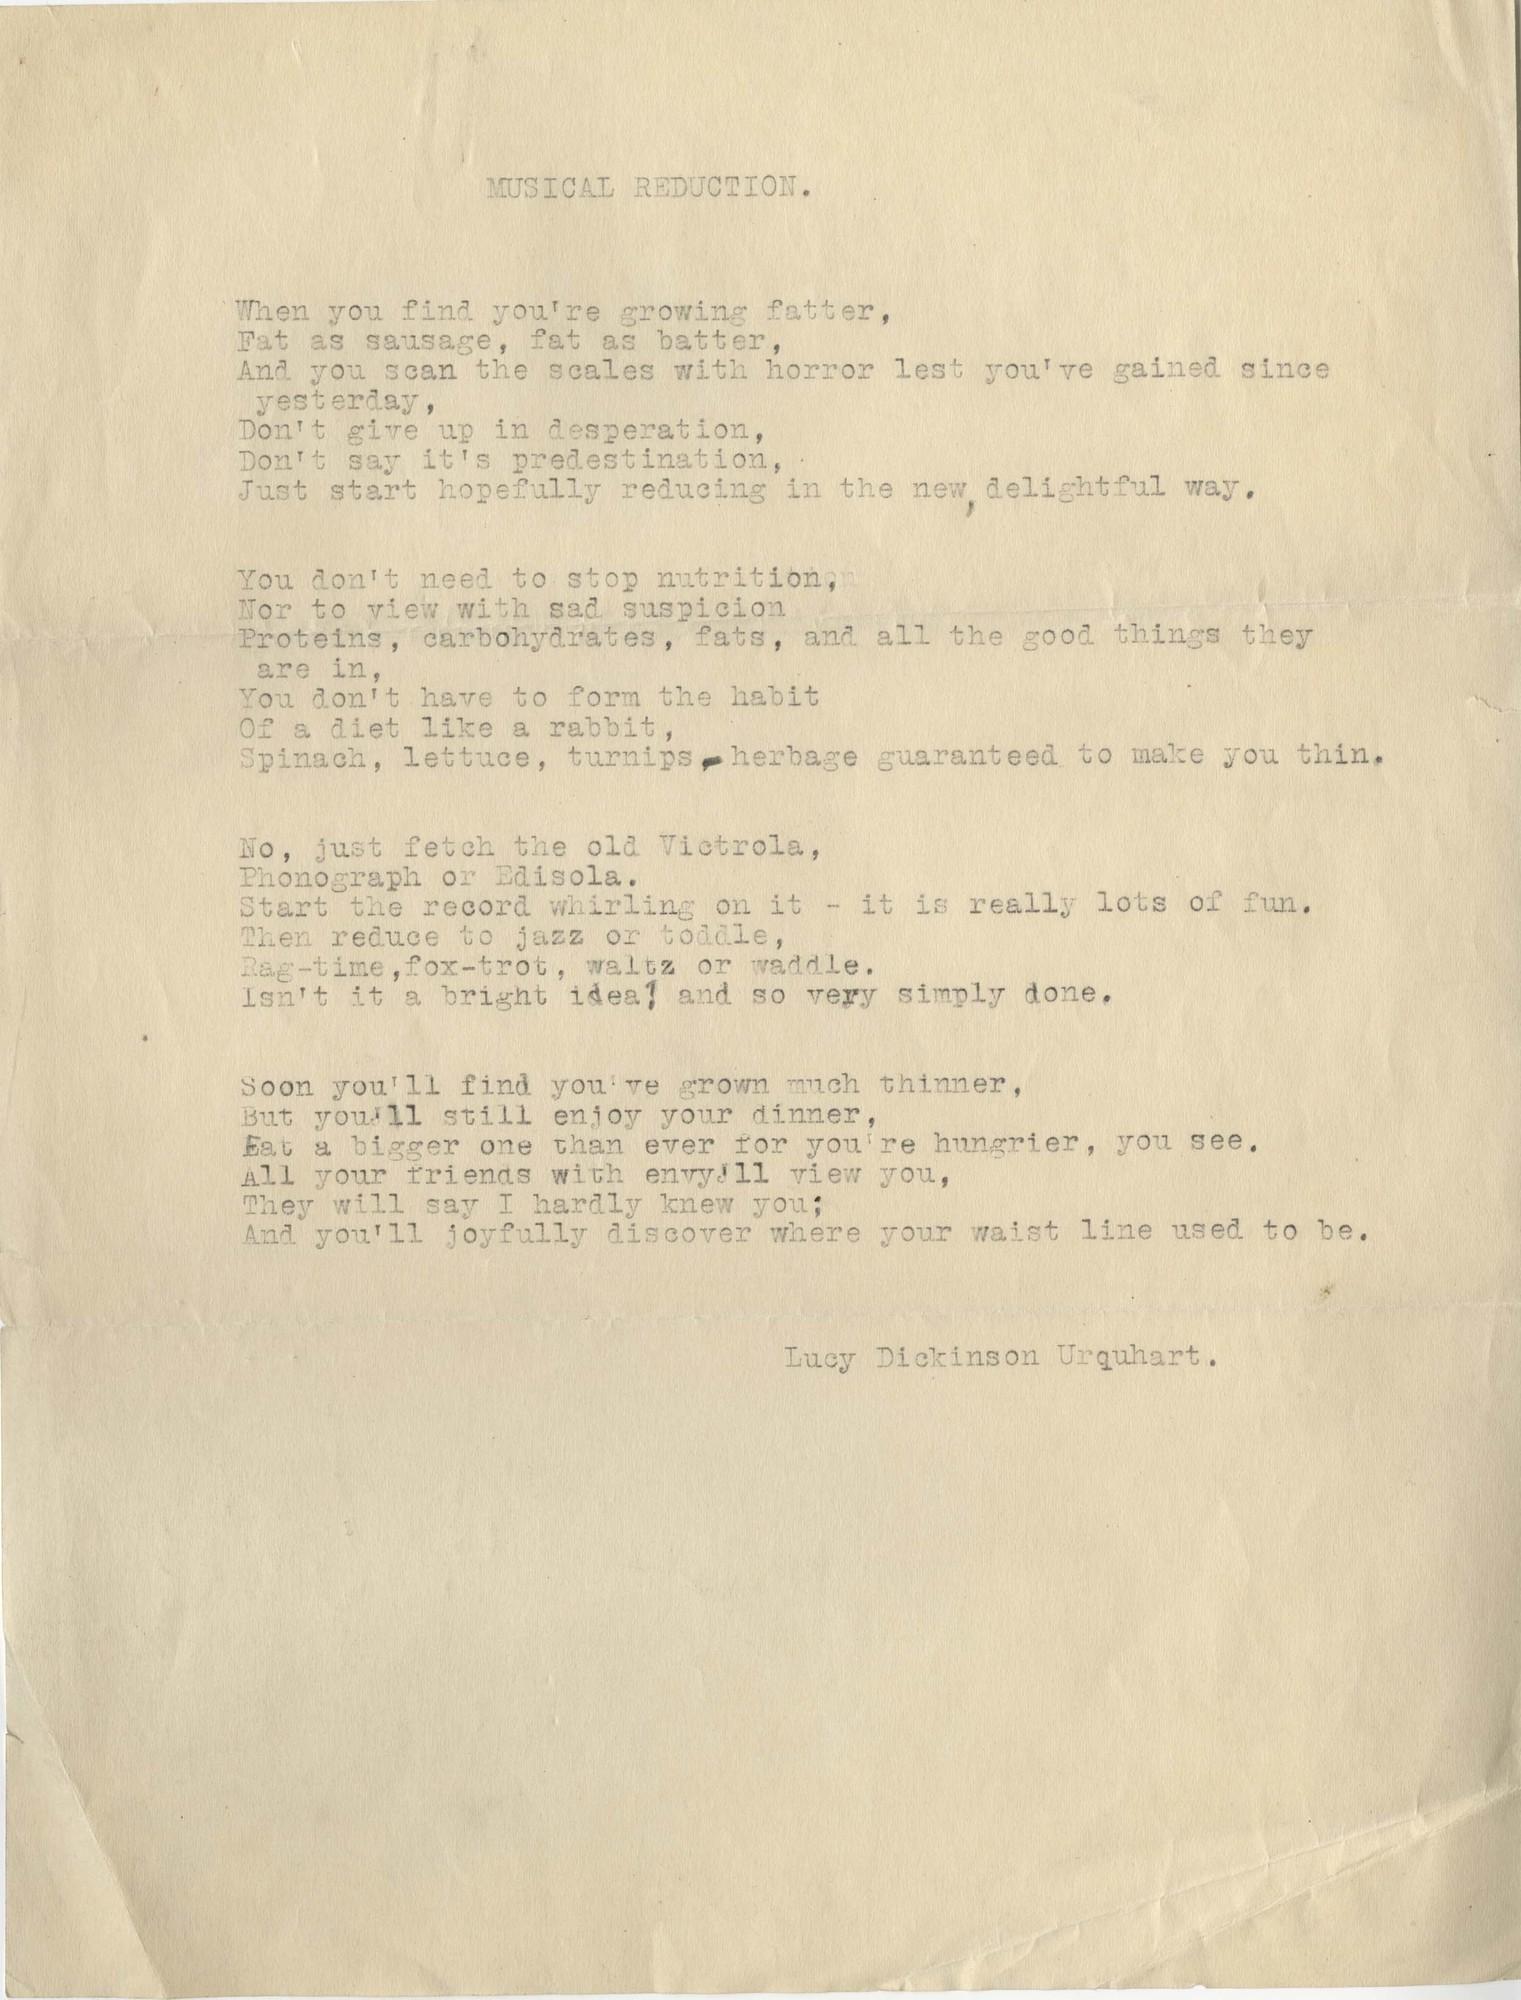 Ms1987-046_UrquhartLucy_B2F7_Poem_MusicalReduction.jpg